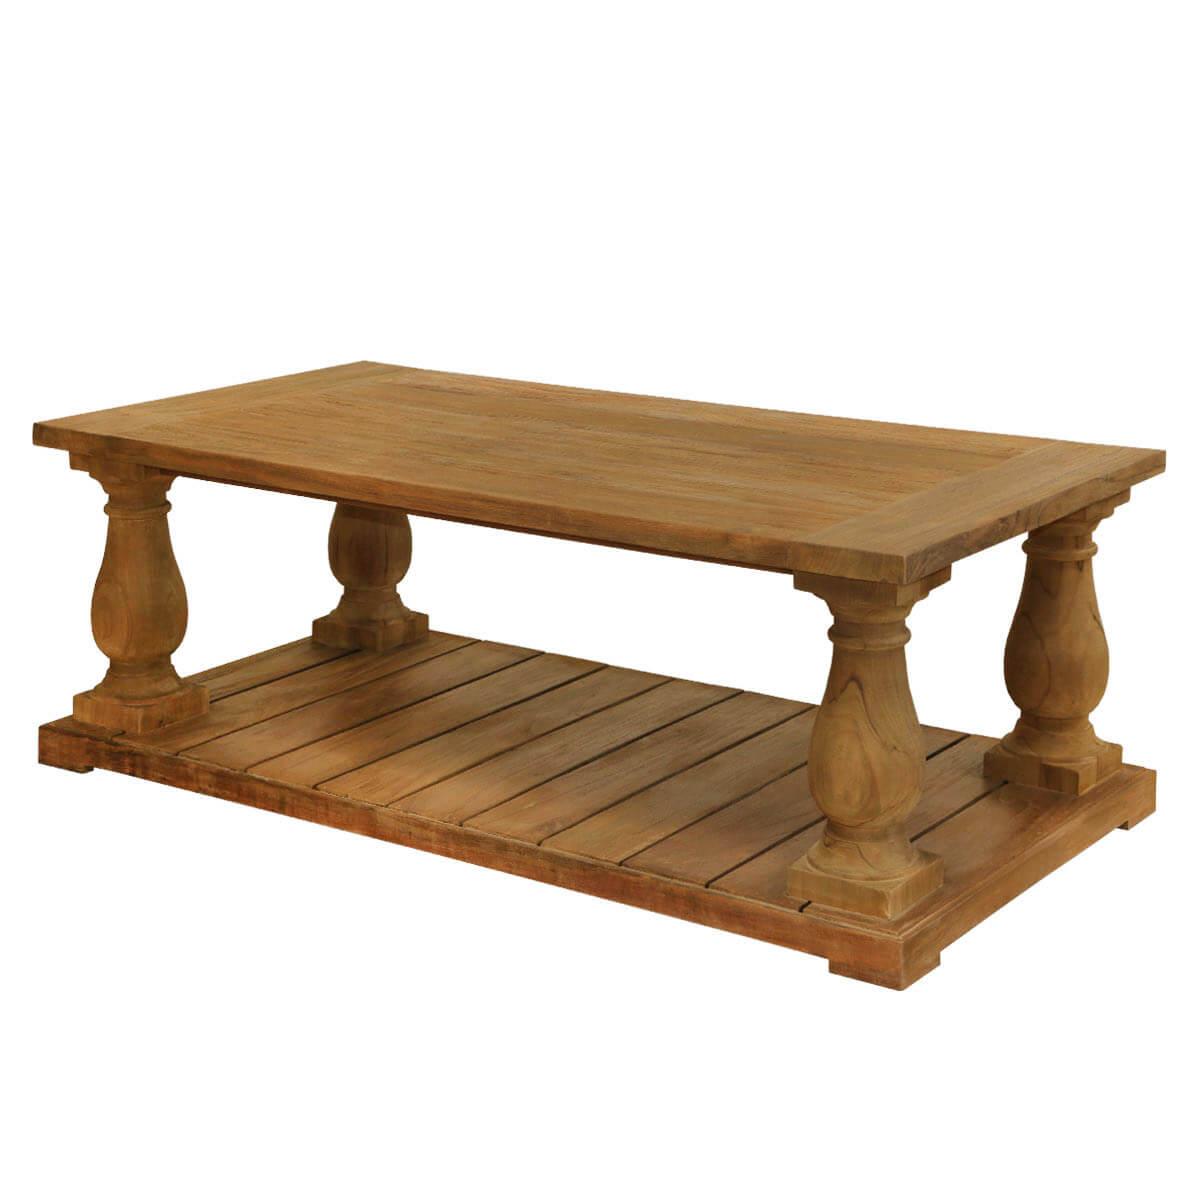 Reclaimed Teak Wood Balustrade Coffee Table